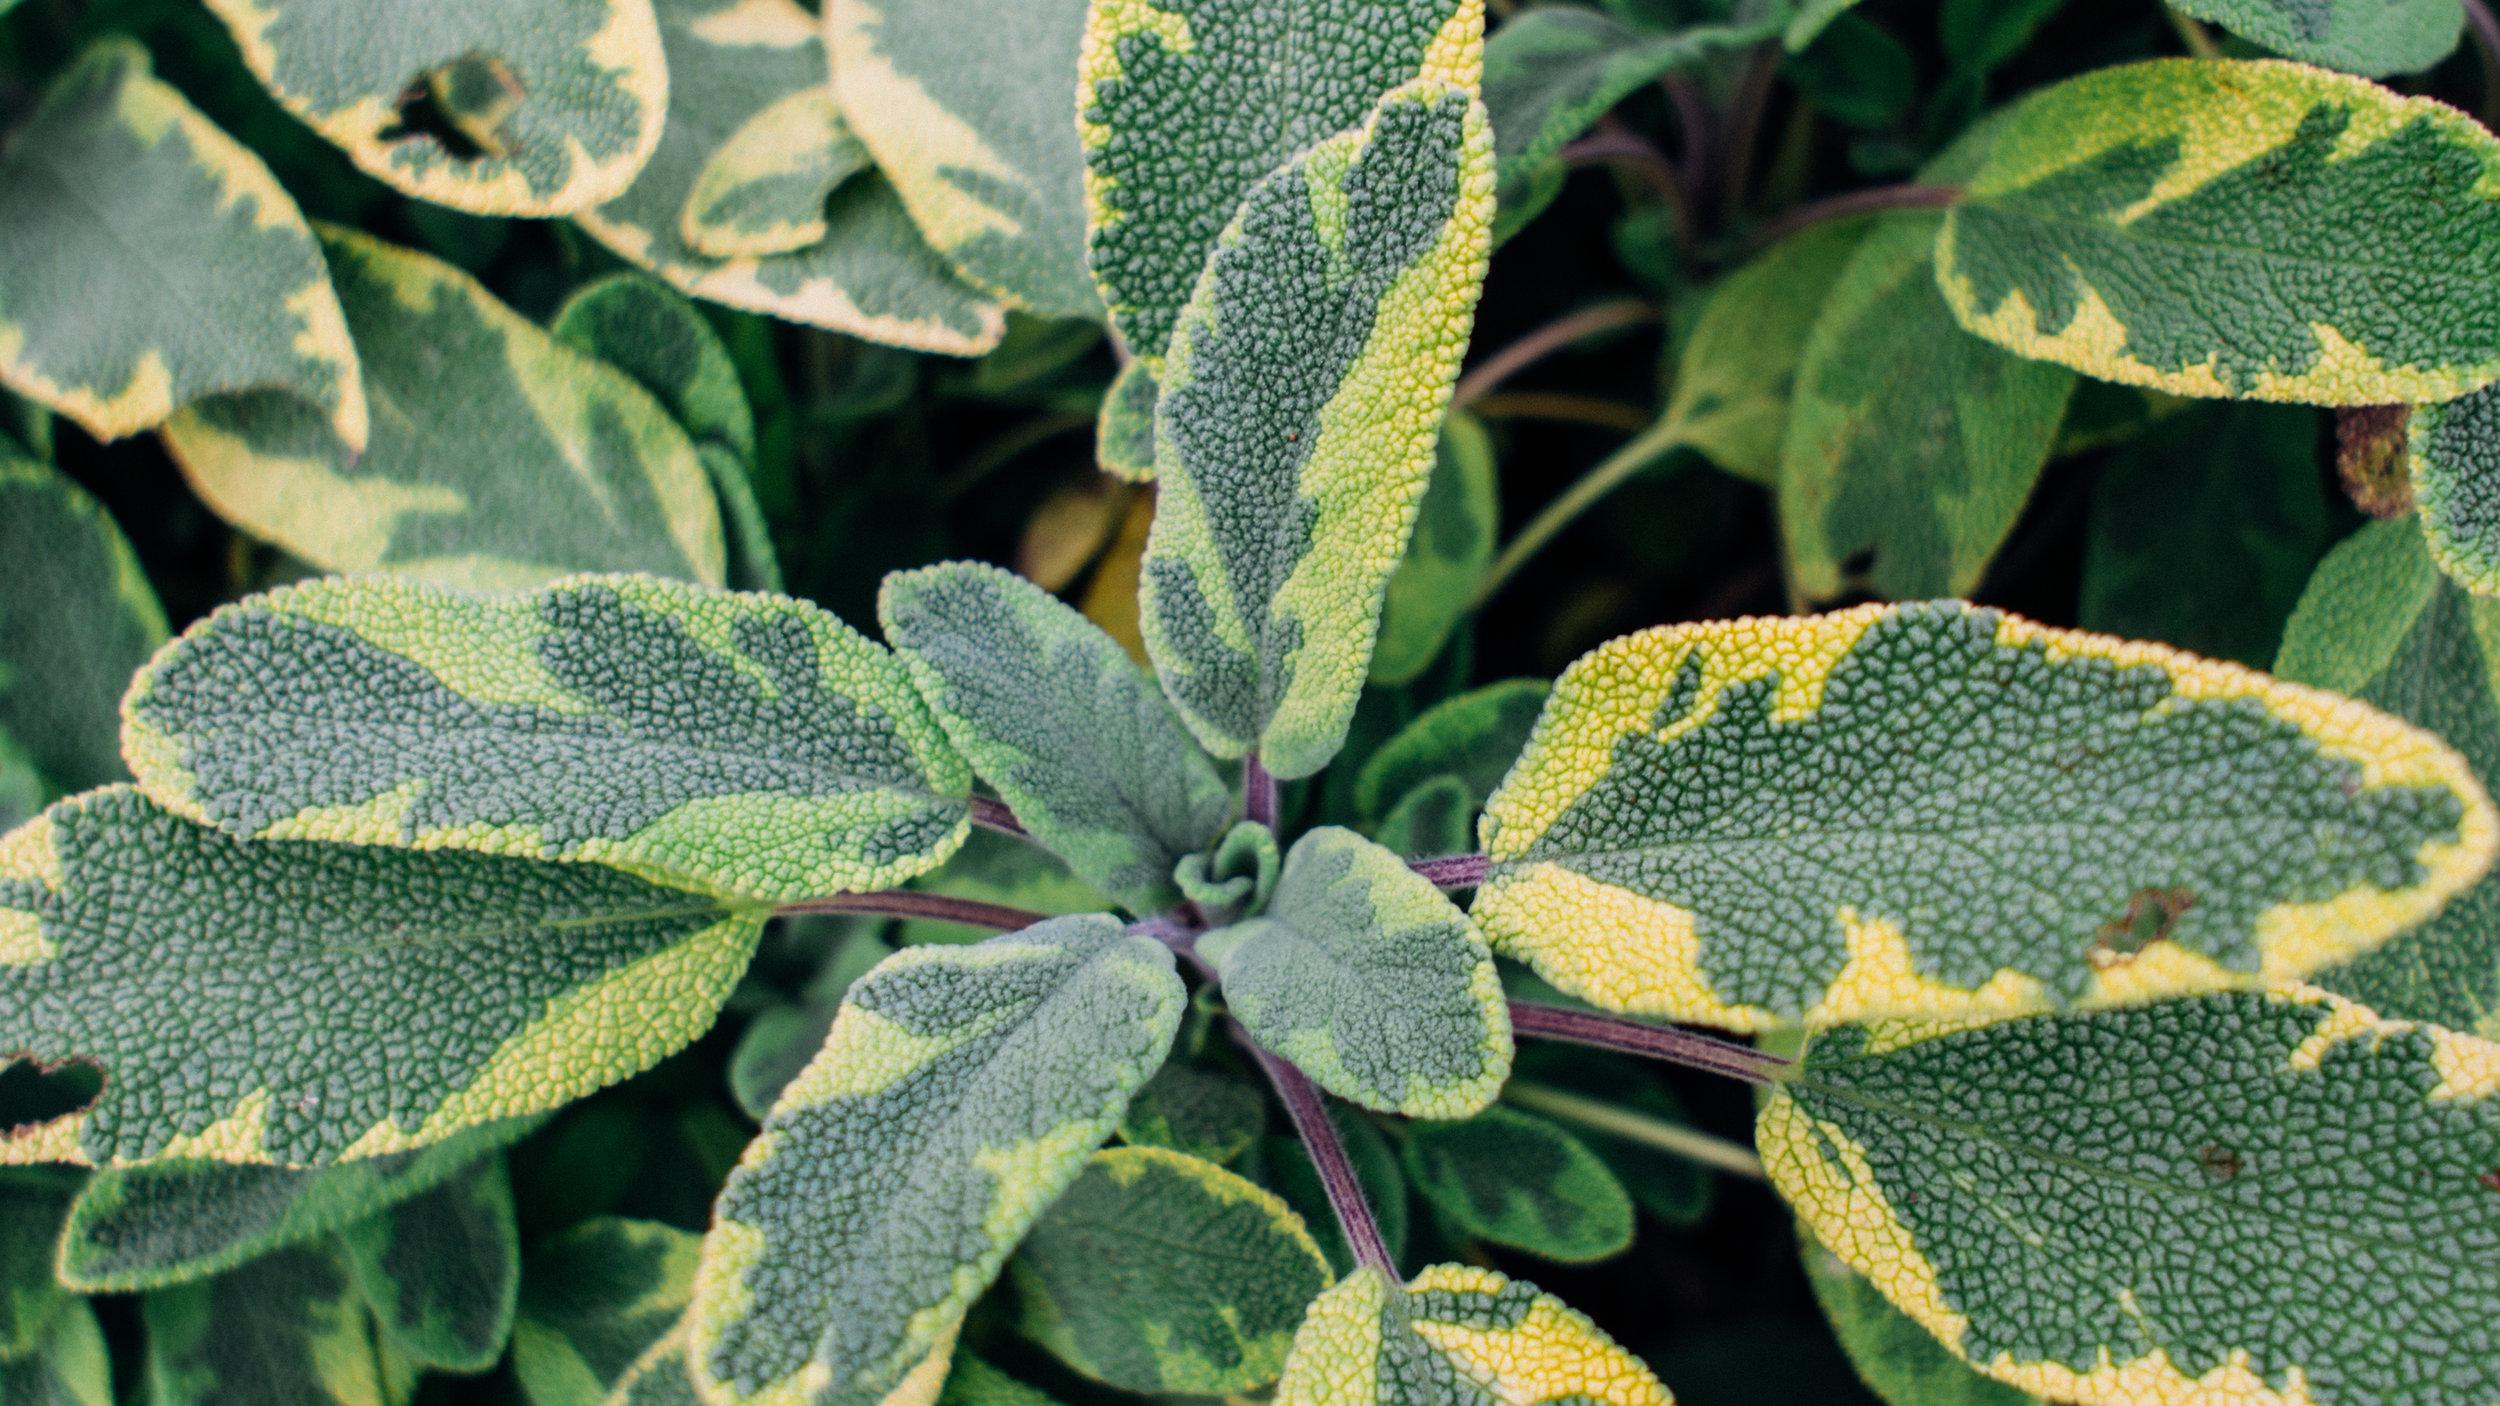 psf_herbs-5.jpg